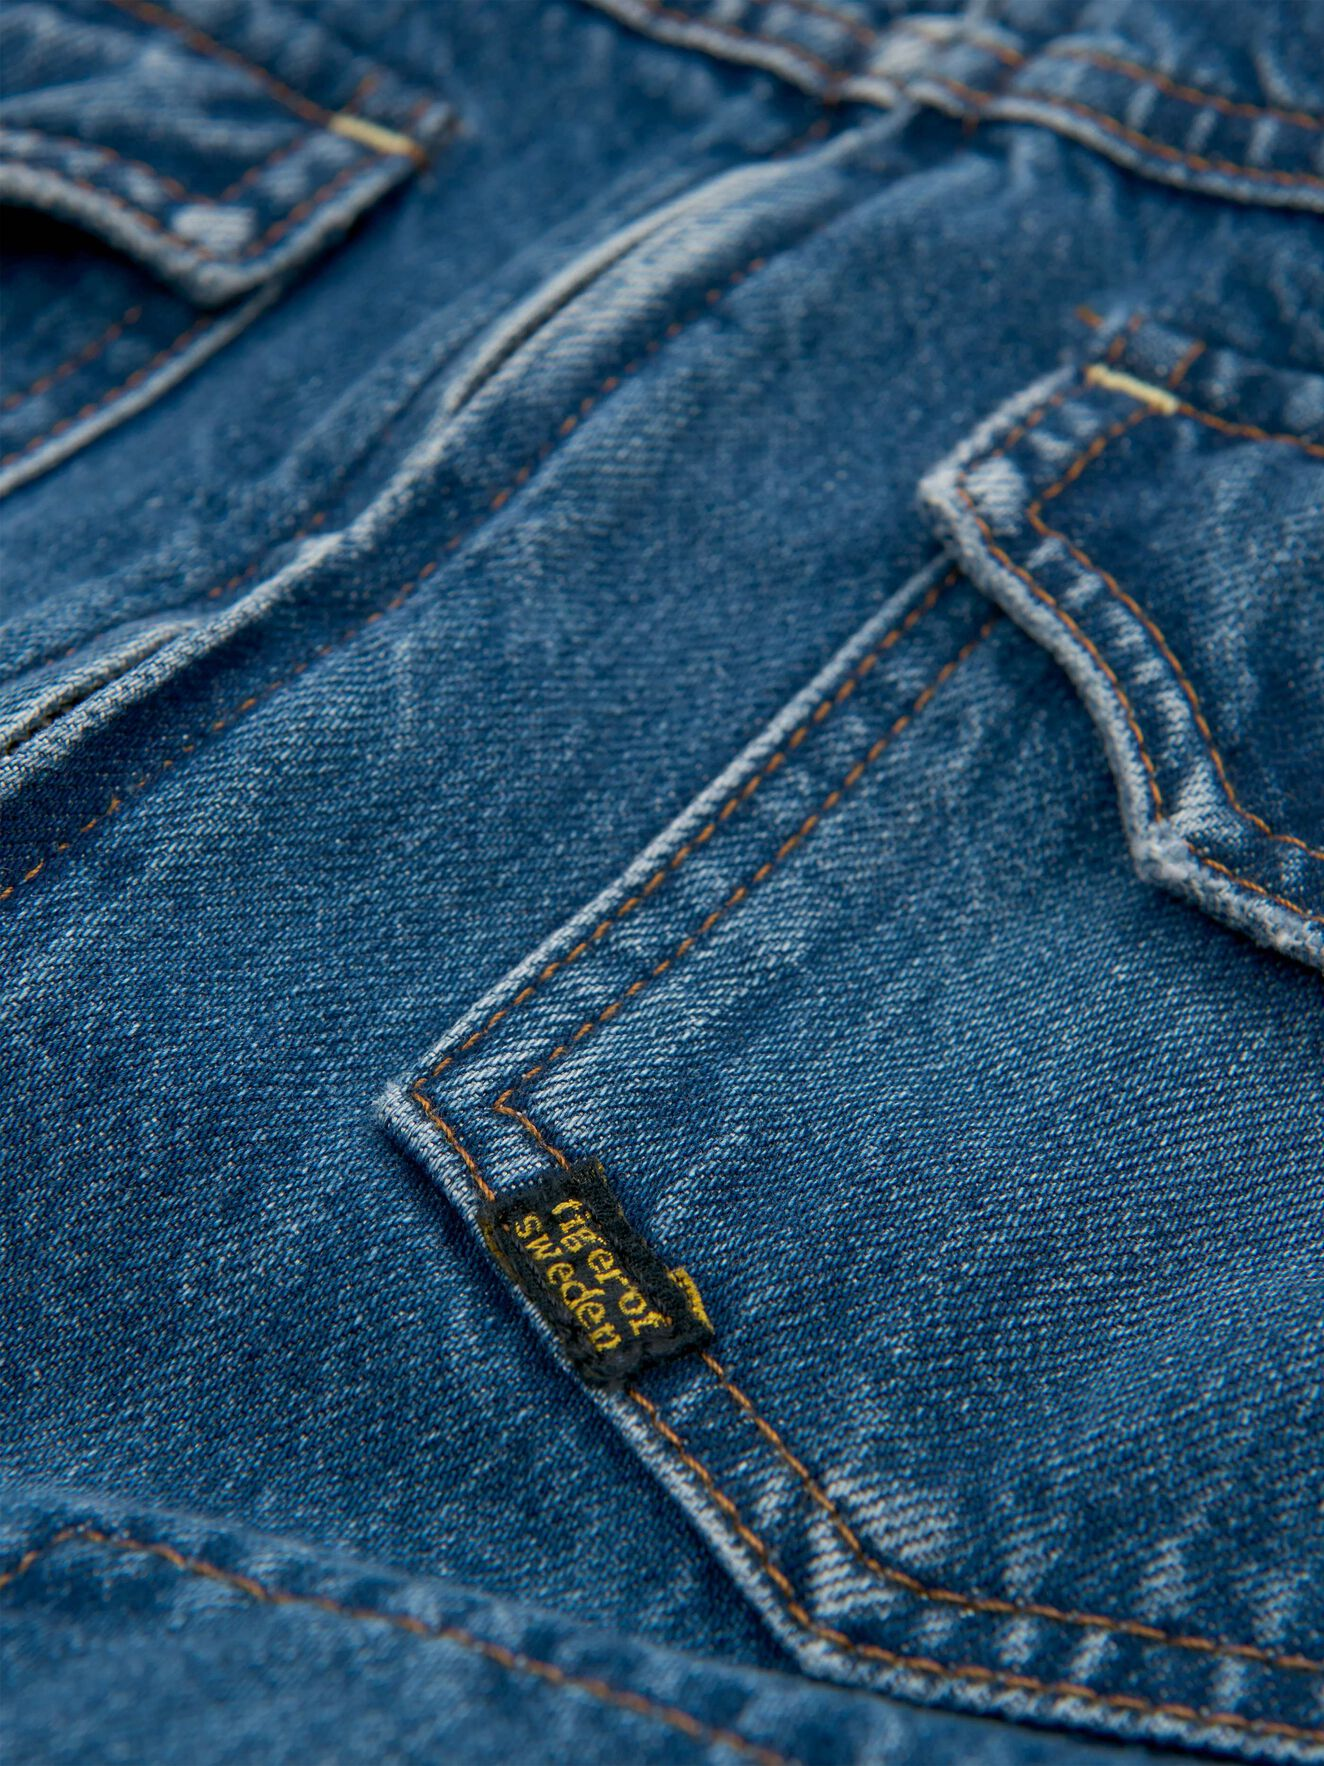 Peel Jacket in Dust blue from Tiger of Sweden